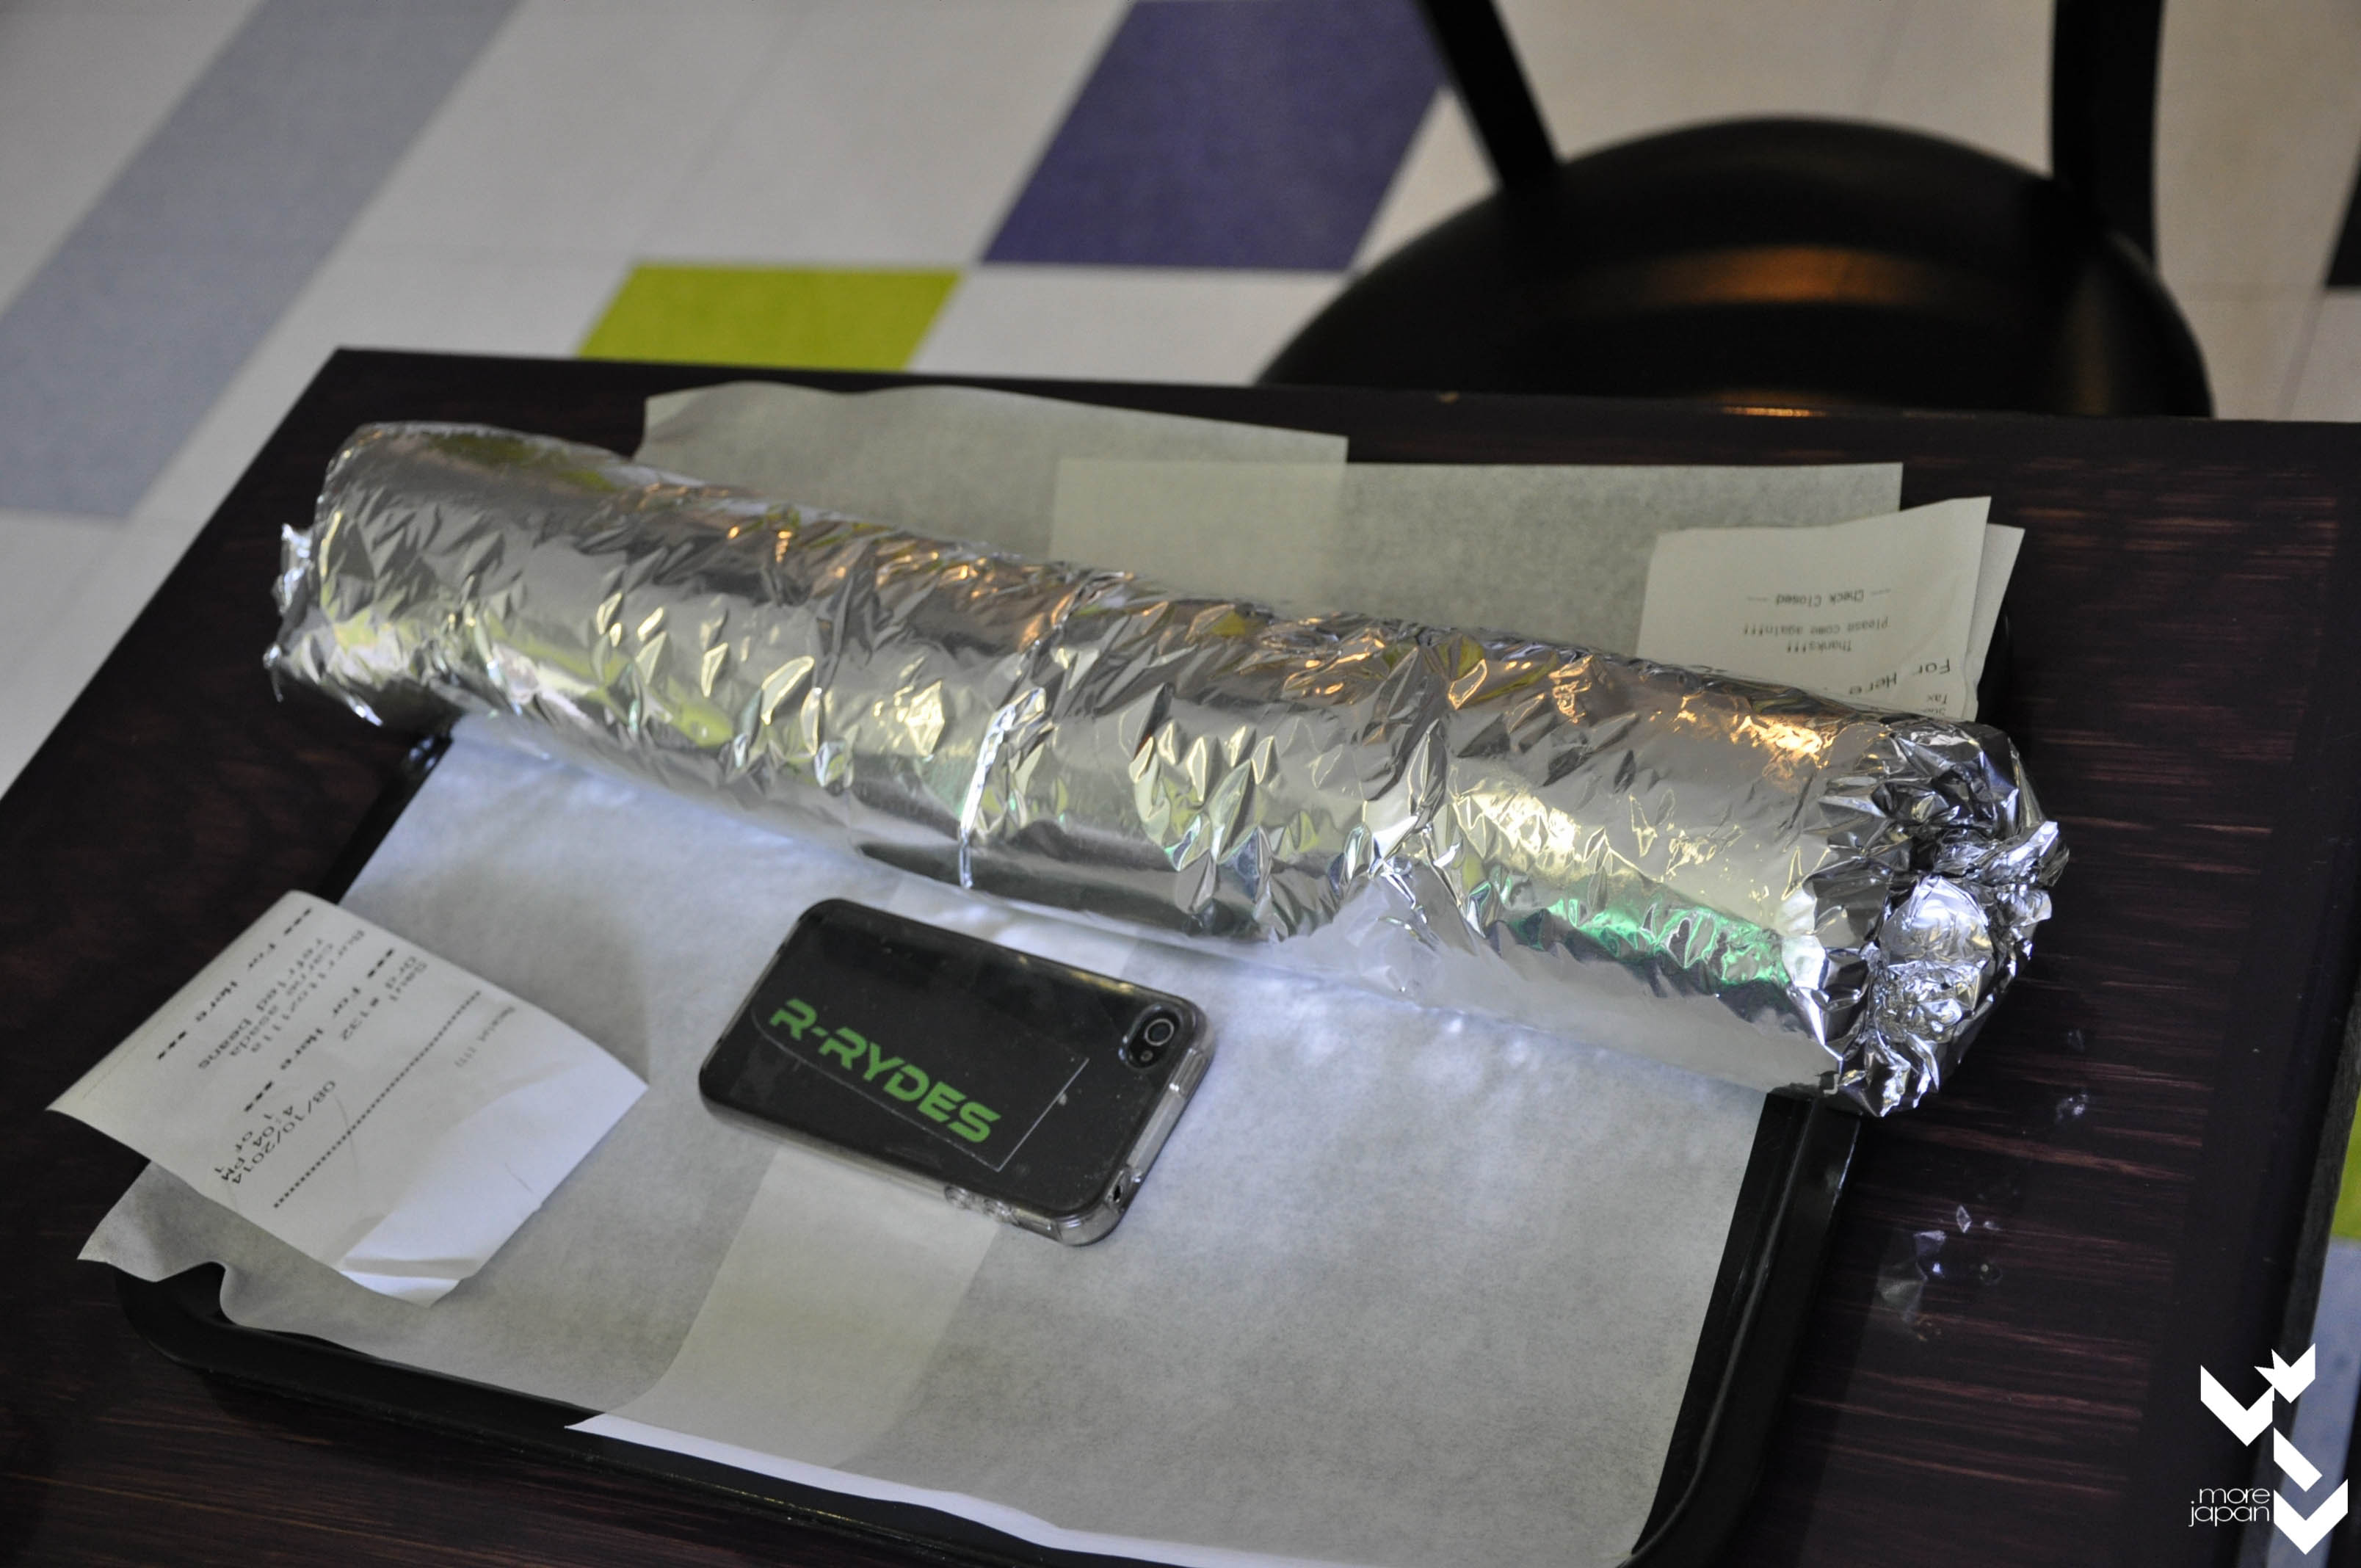 ... giant burritos confirmed.